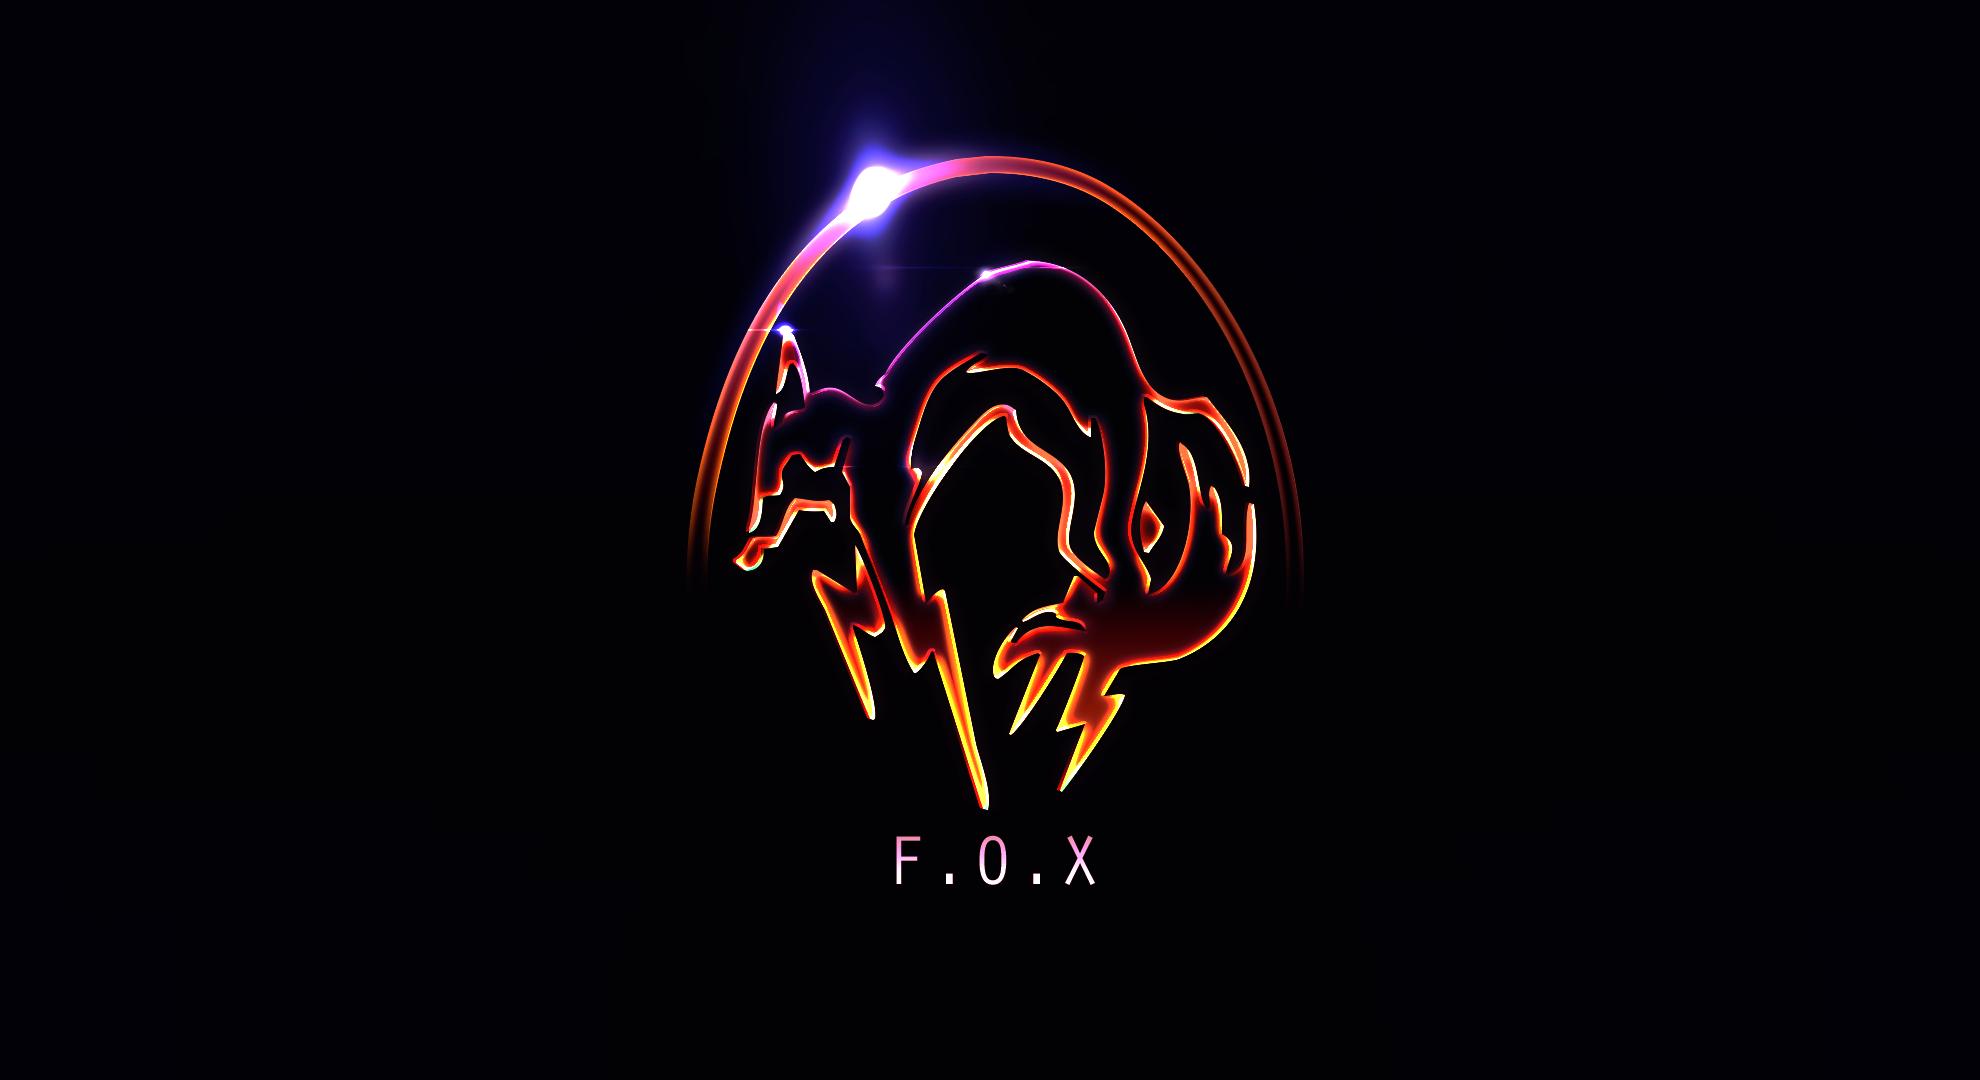 Fox Hound Wallpapers 1980x1080